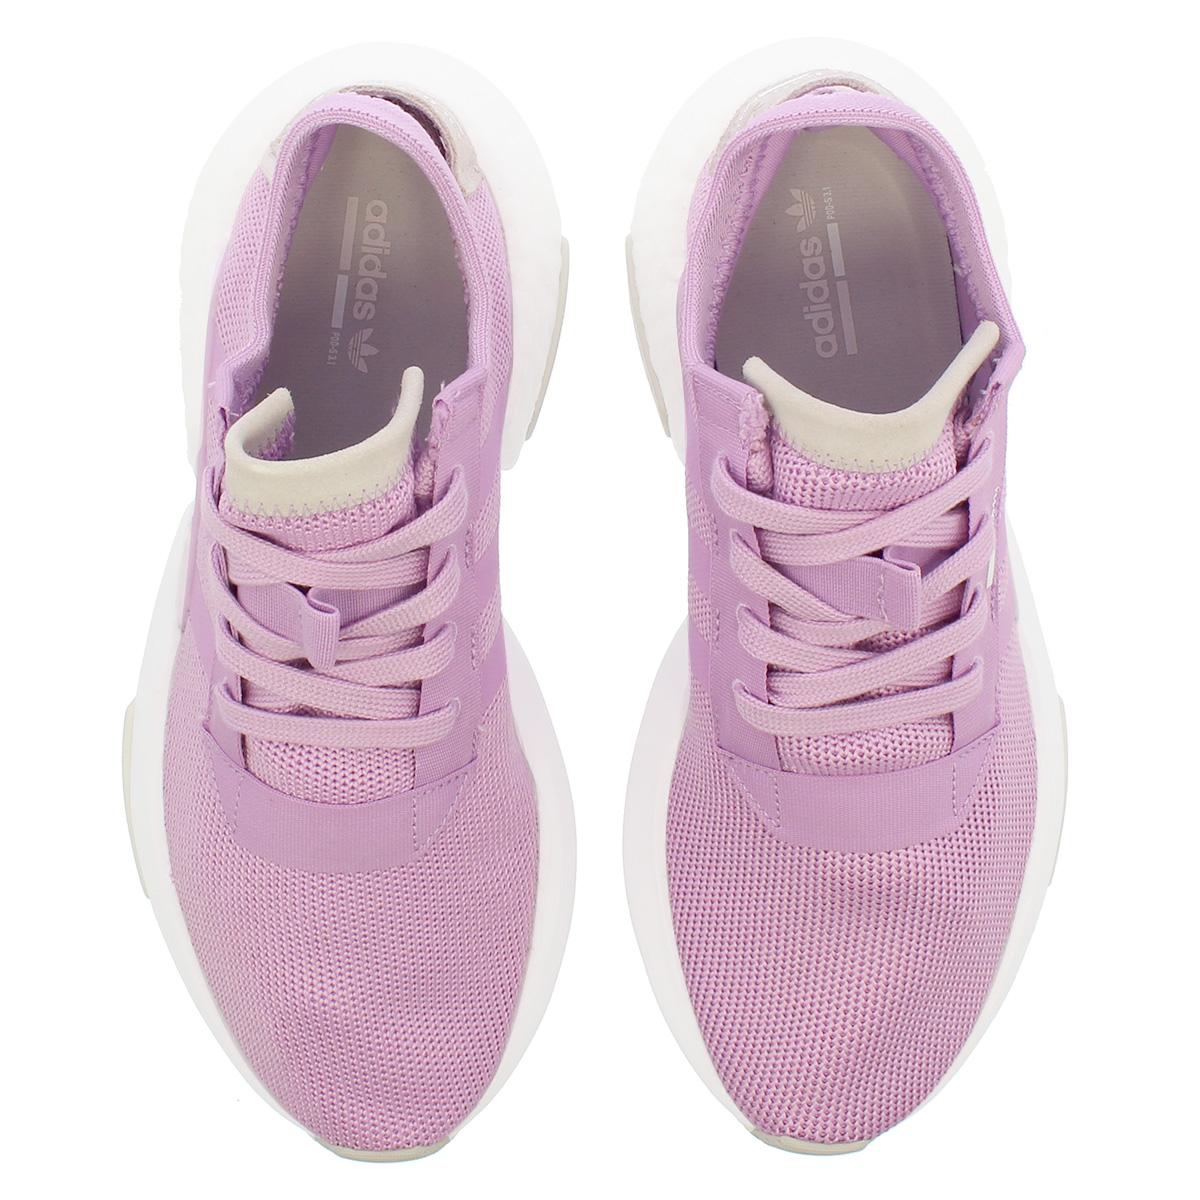 0b9a4a5e580733 adidas POD-S3 .1W Adidas POD-S3.1 women CLEAR LILAC CLEAR LILAC ORCHID TINT  b37469